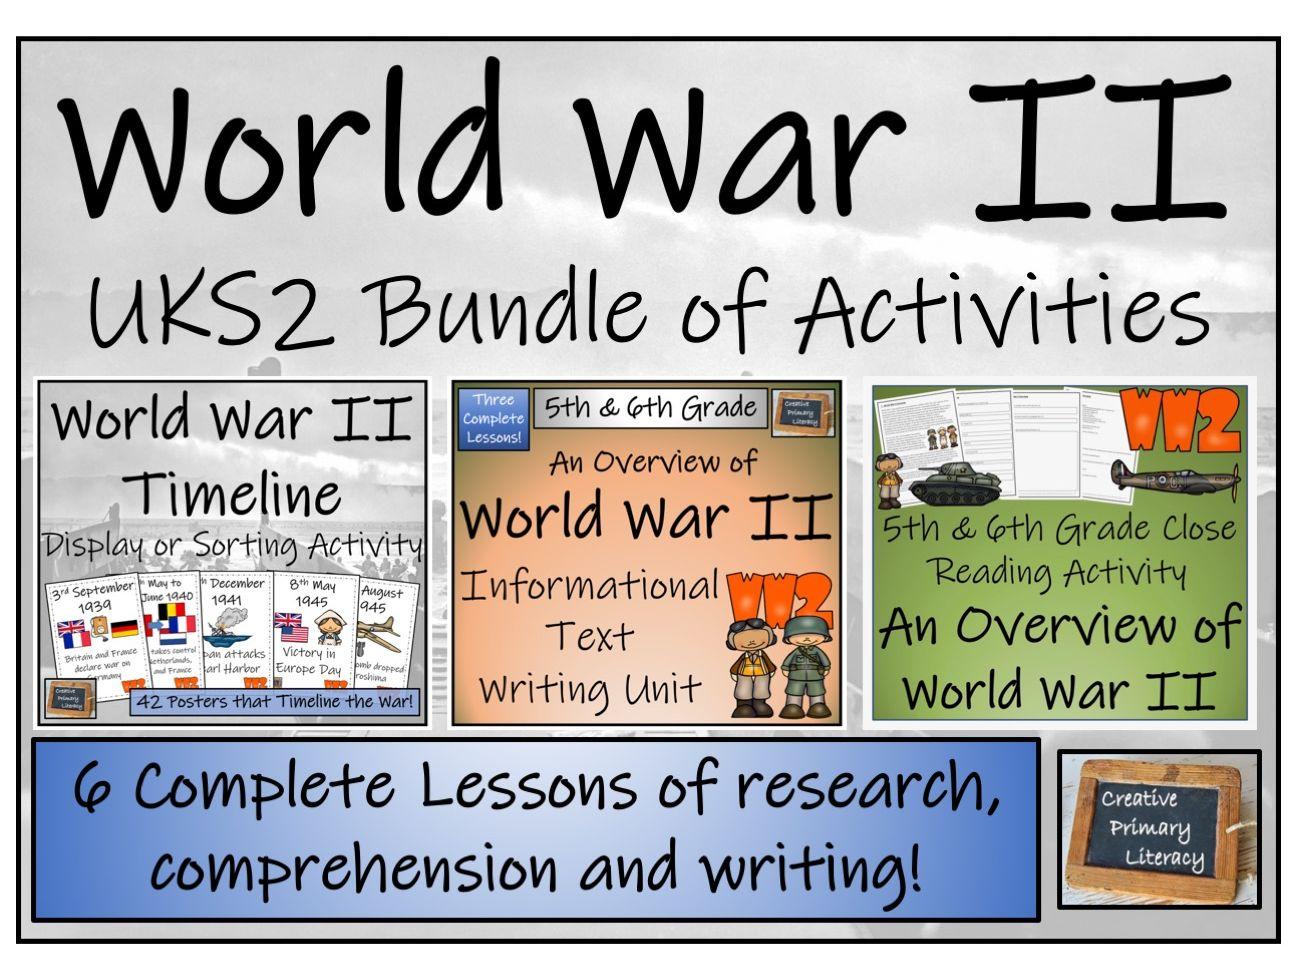 UKS2 World War II - Display, Sorting, Reading Comprehension & Writing Bundle